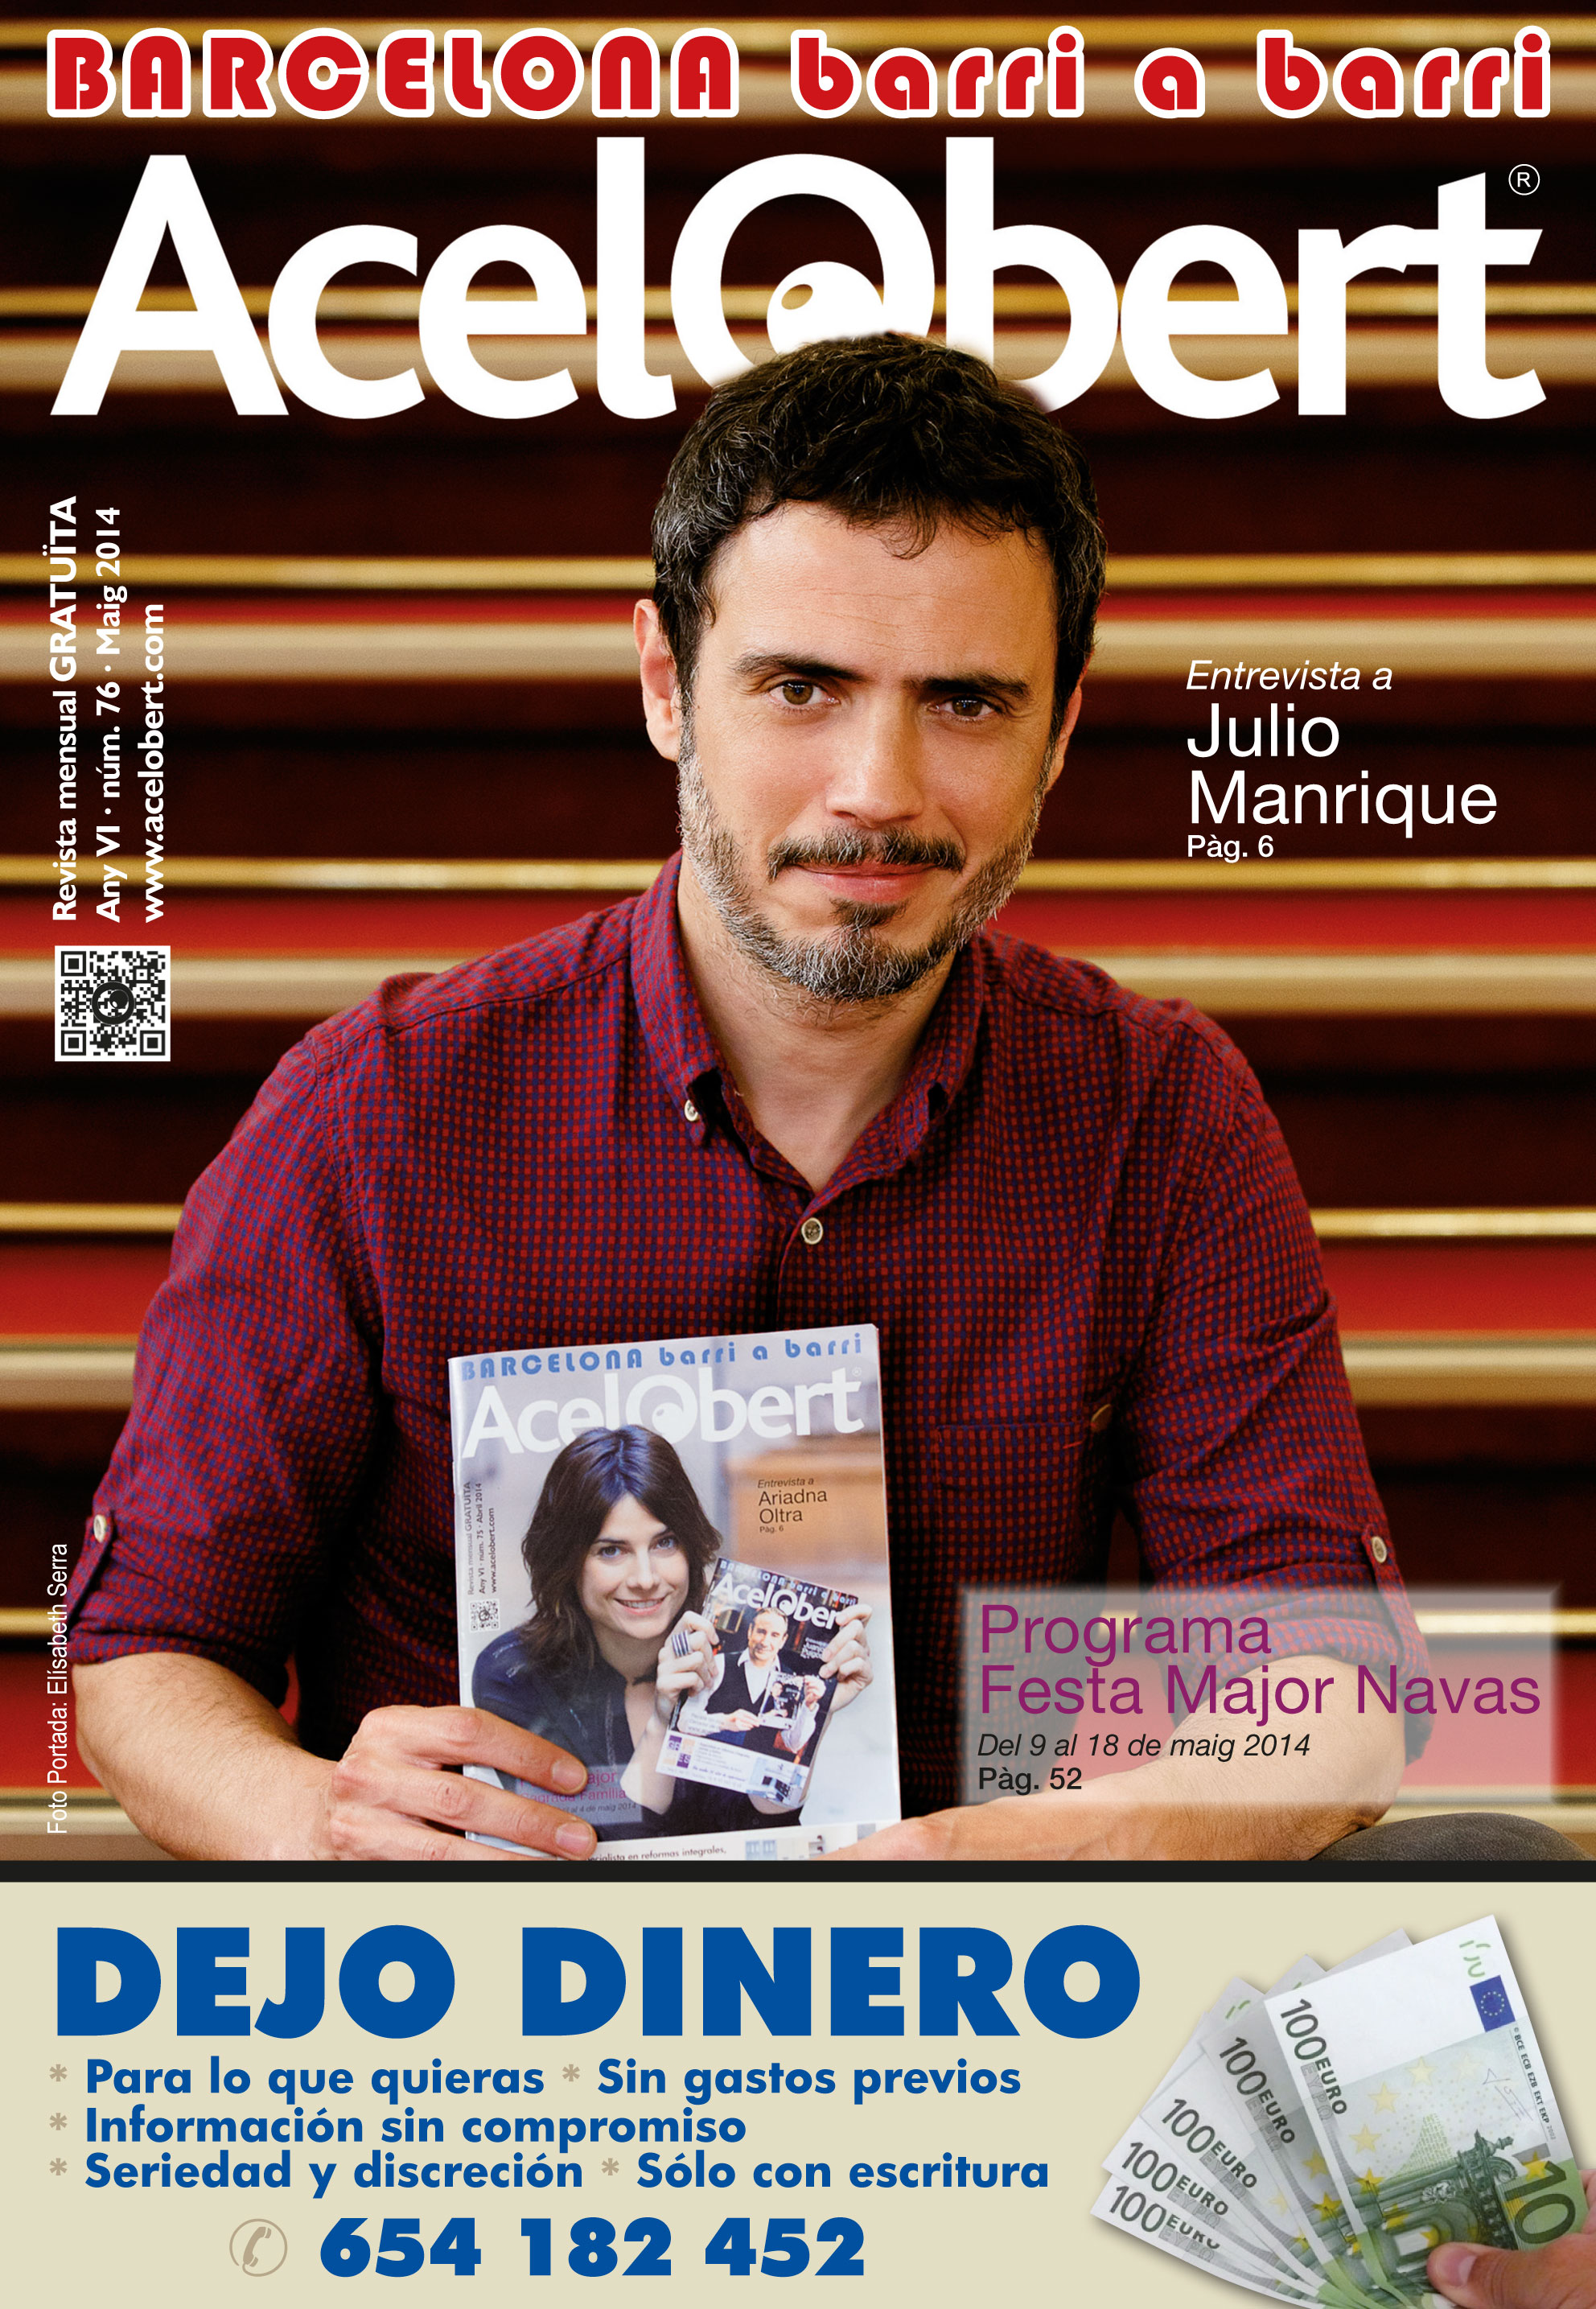 Acelobert Barcelona nº76 Maig 2014